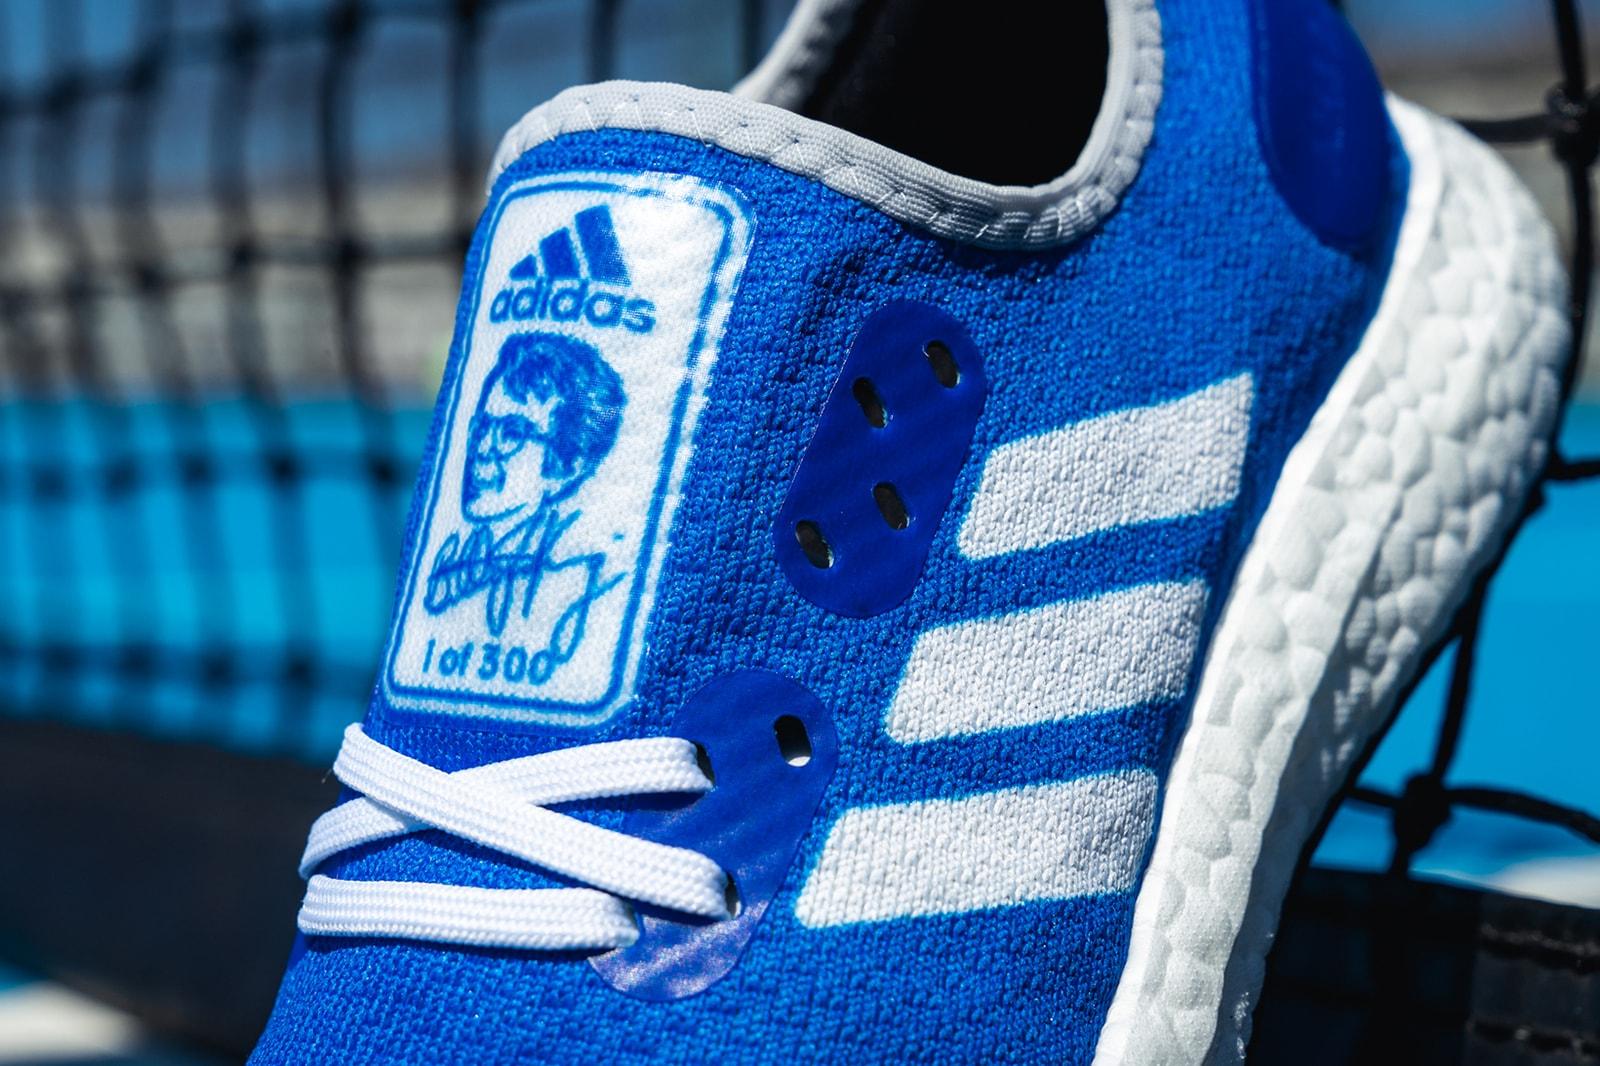 Billie Jean King adidas AM4BJK SPEEDFACTORY Blue